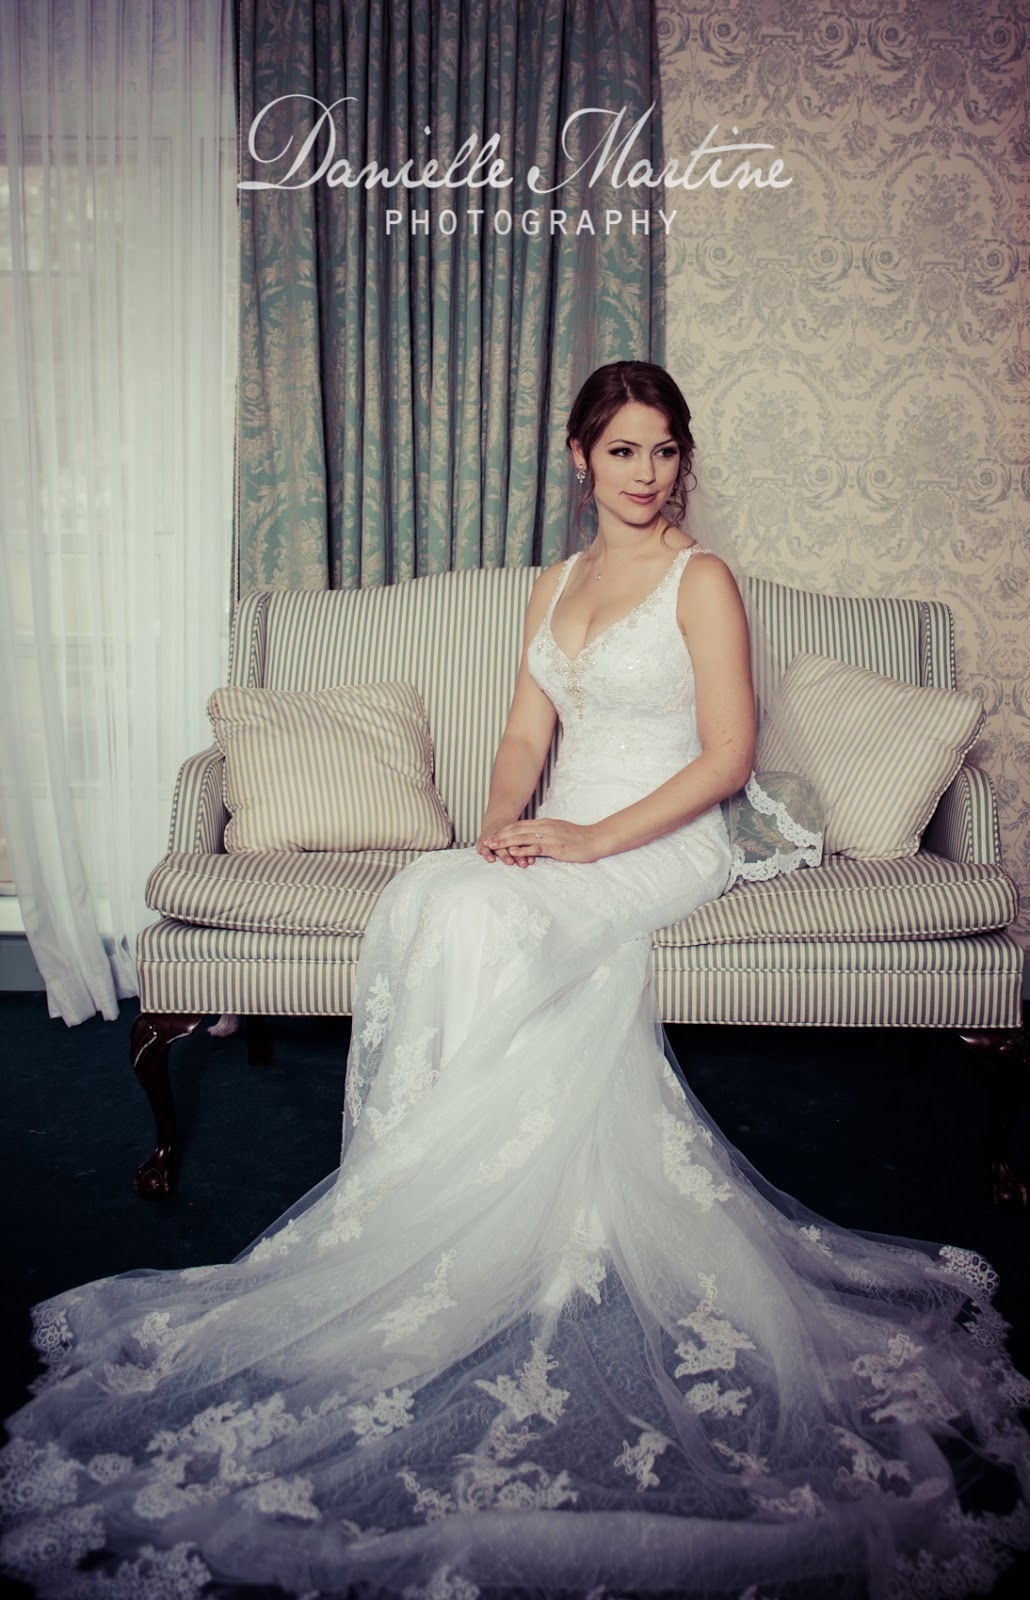 Danielle martin wedding